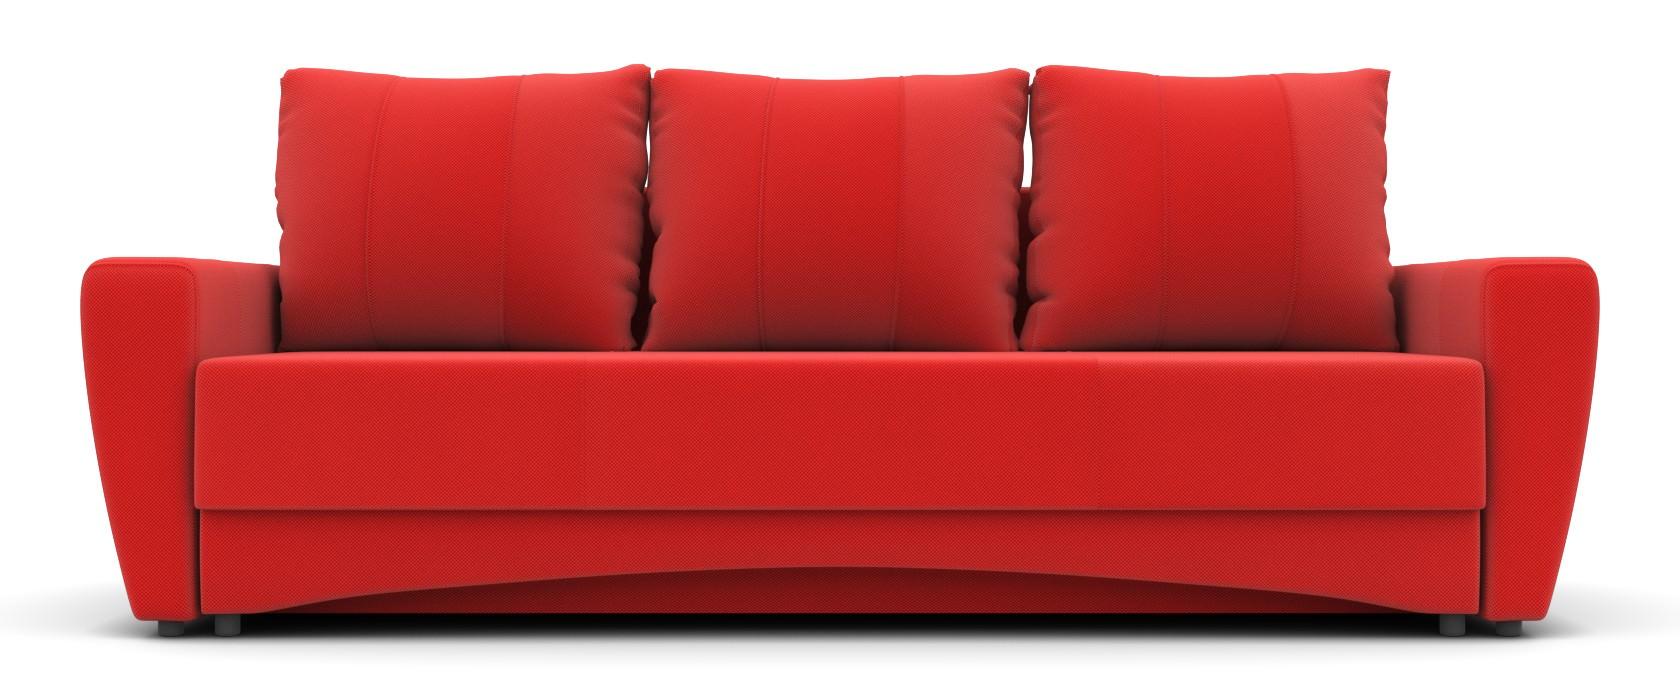 Тримісний диван Andrea - Pufetto